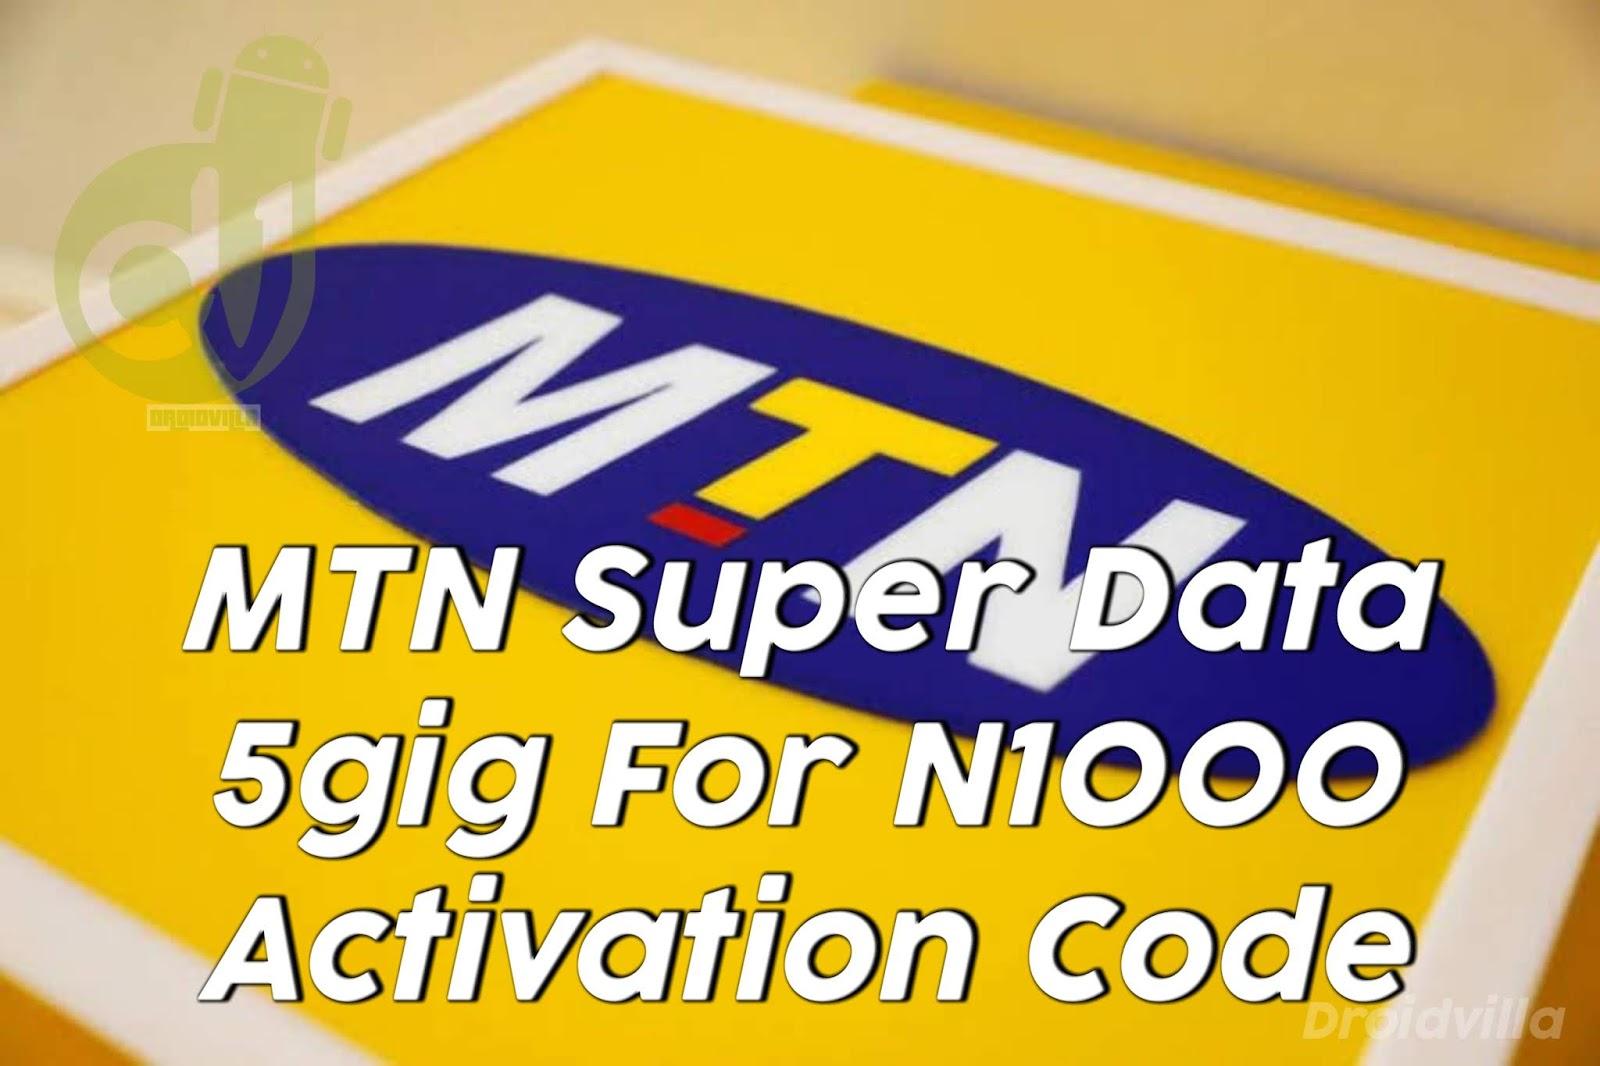 MTN Super data code